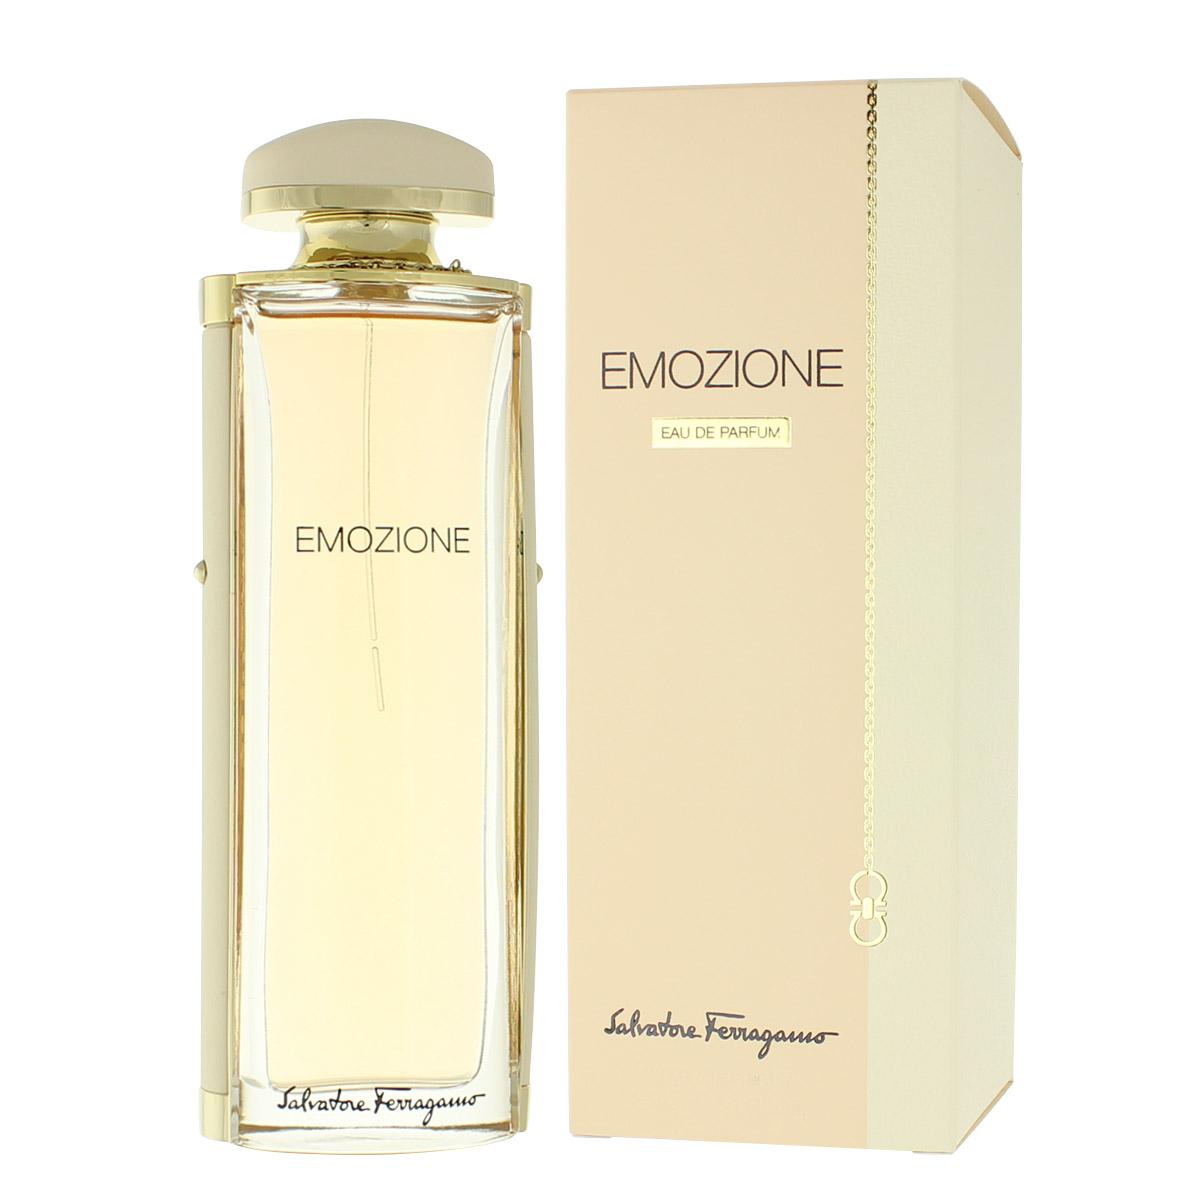 Salvatore Ferragamo Emozione Eau De Parfum 92 ml (woman) 80869